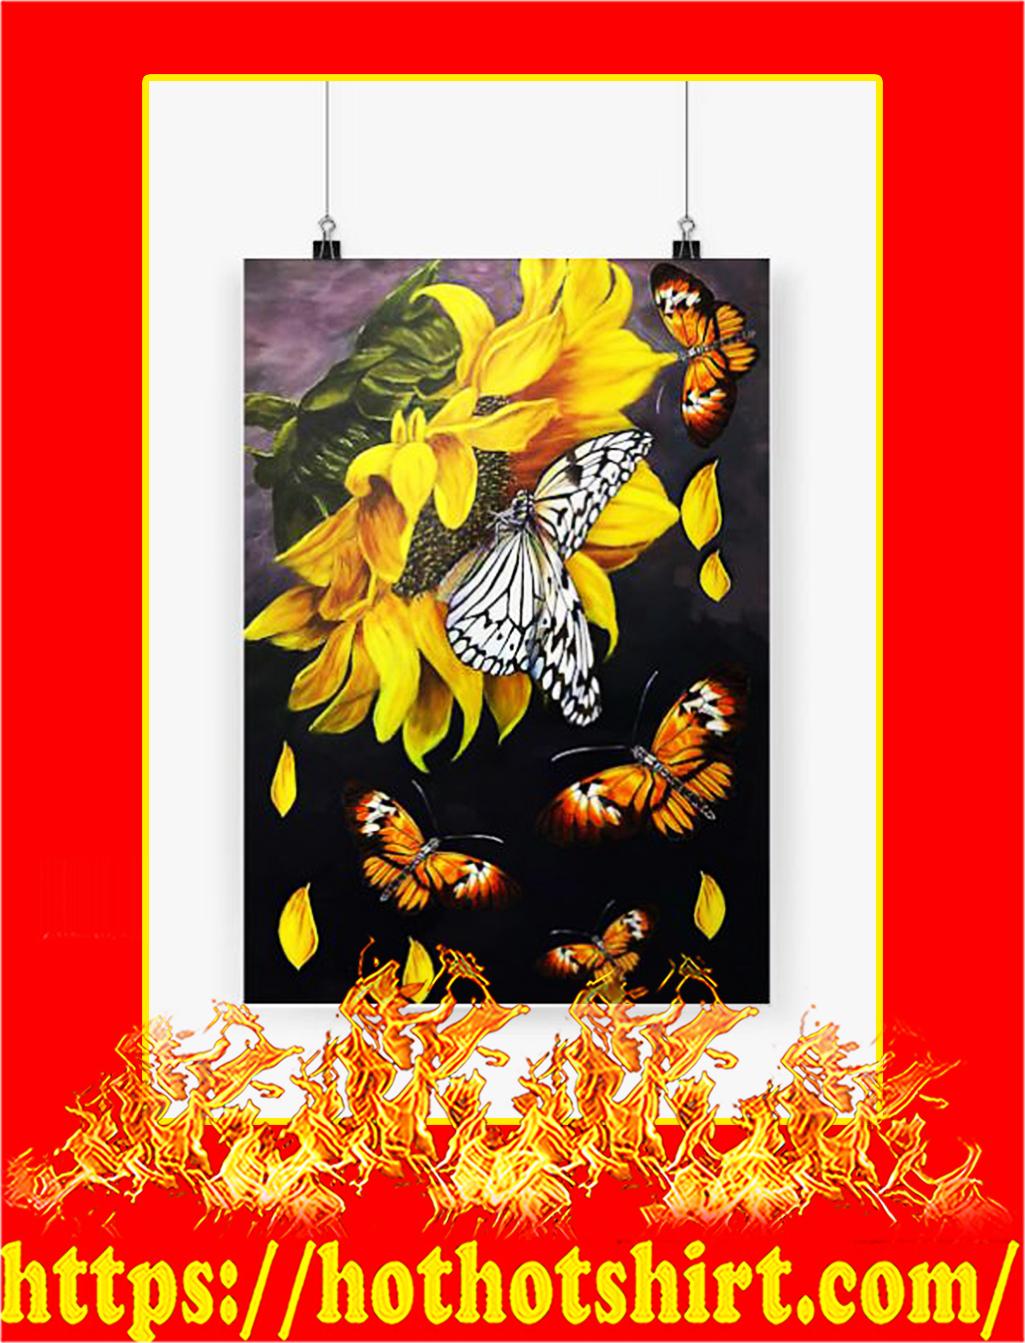 Butterfly sunflower poster - A4